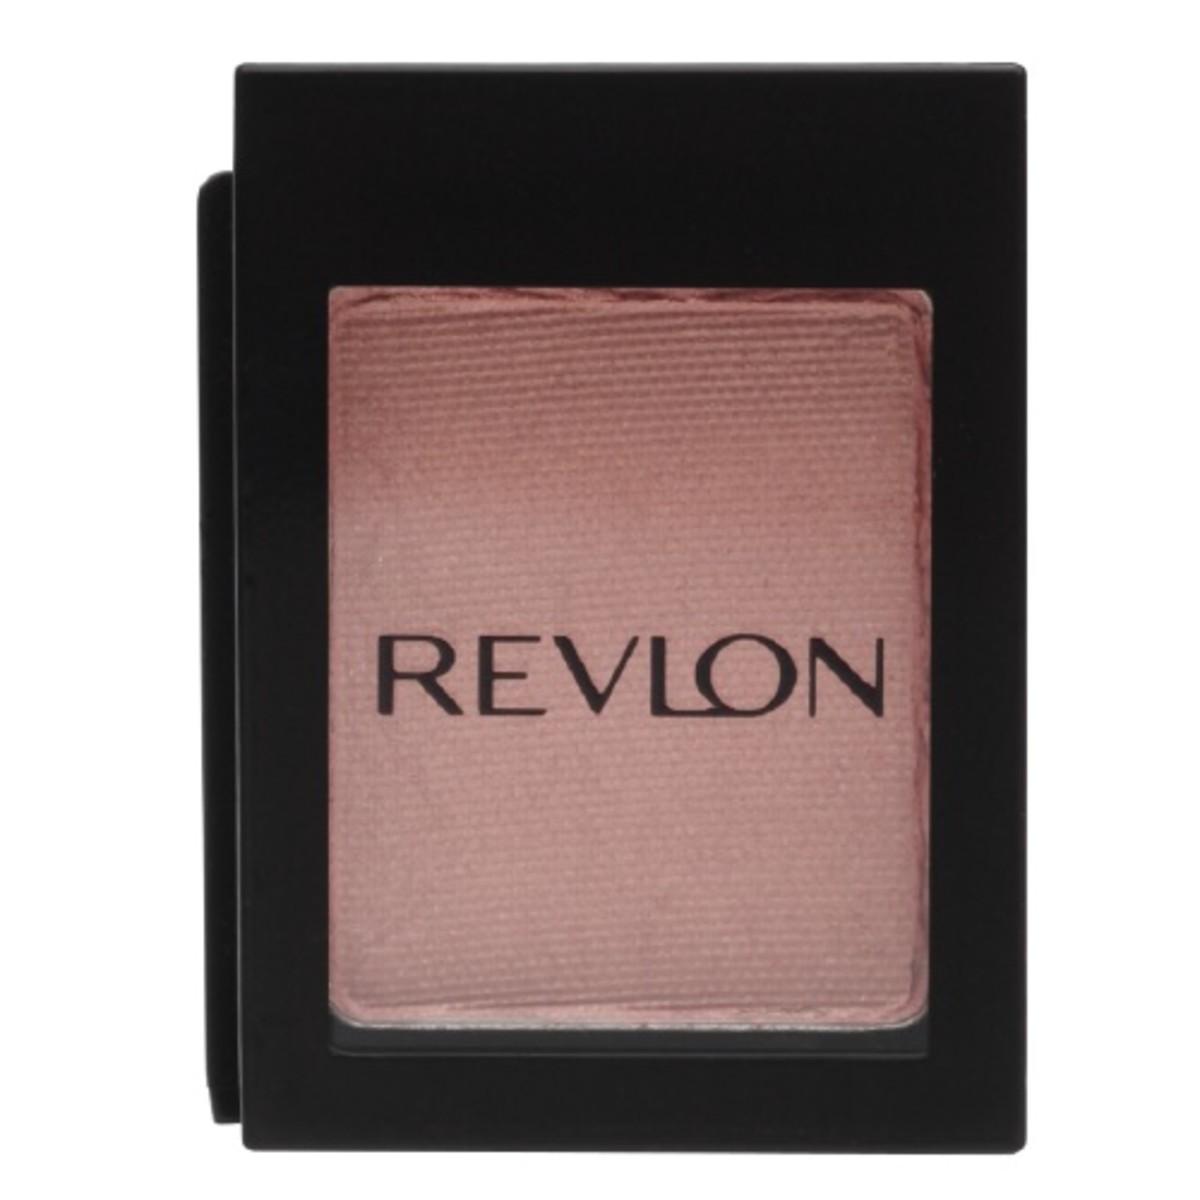 Revlon ColorStay ShadowLinks in Melon